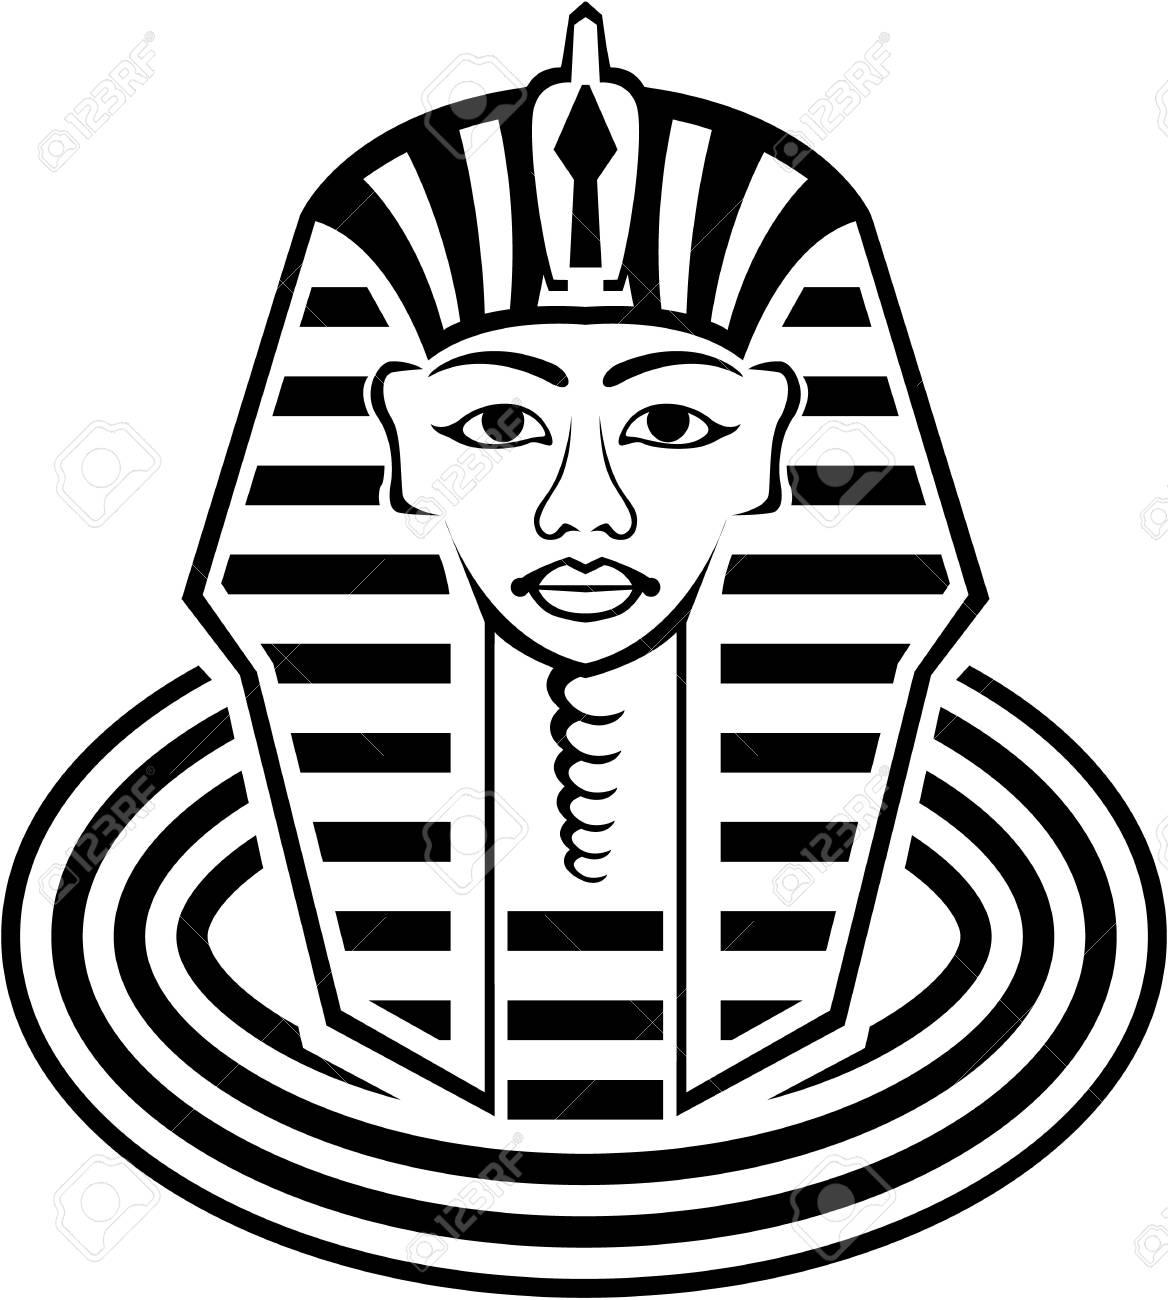 pharaoh illustration clip art image esp file stock photo picture rh 123rf com pharaoh head clipart pharaoh headdress clipart